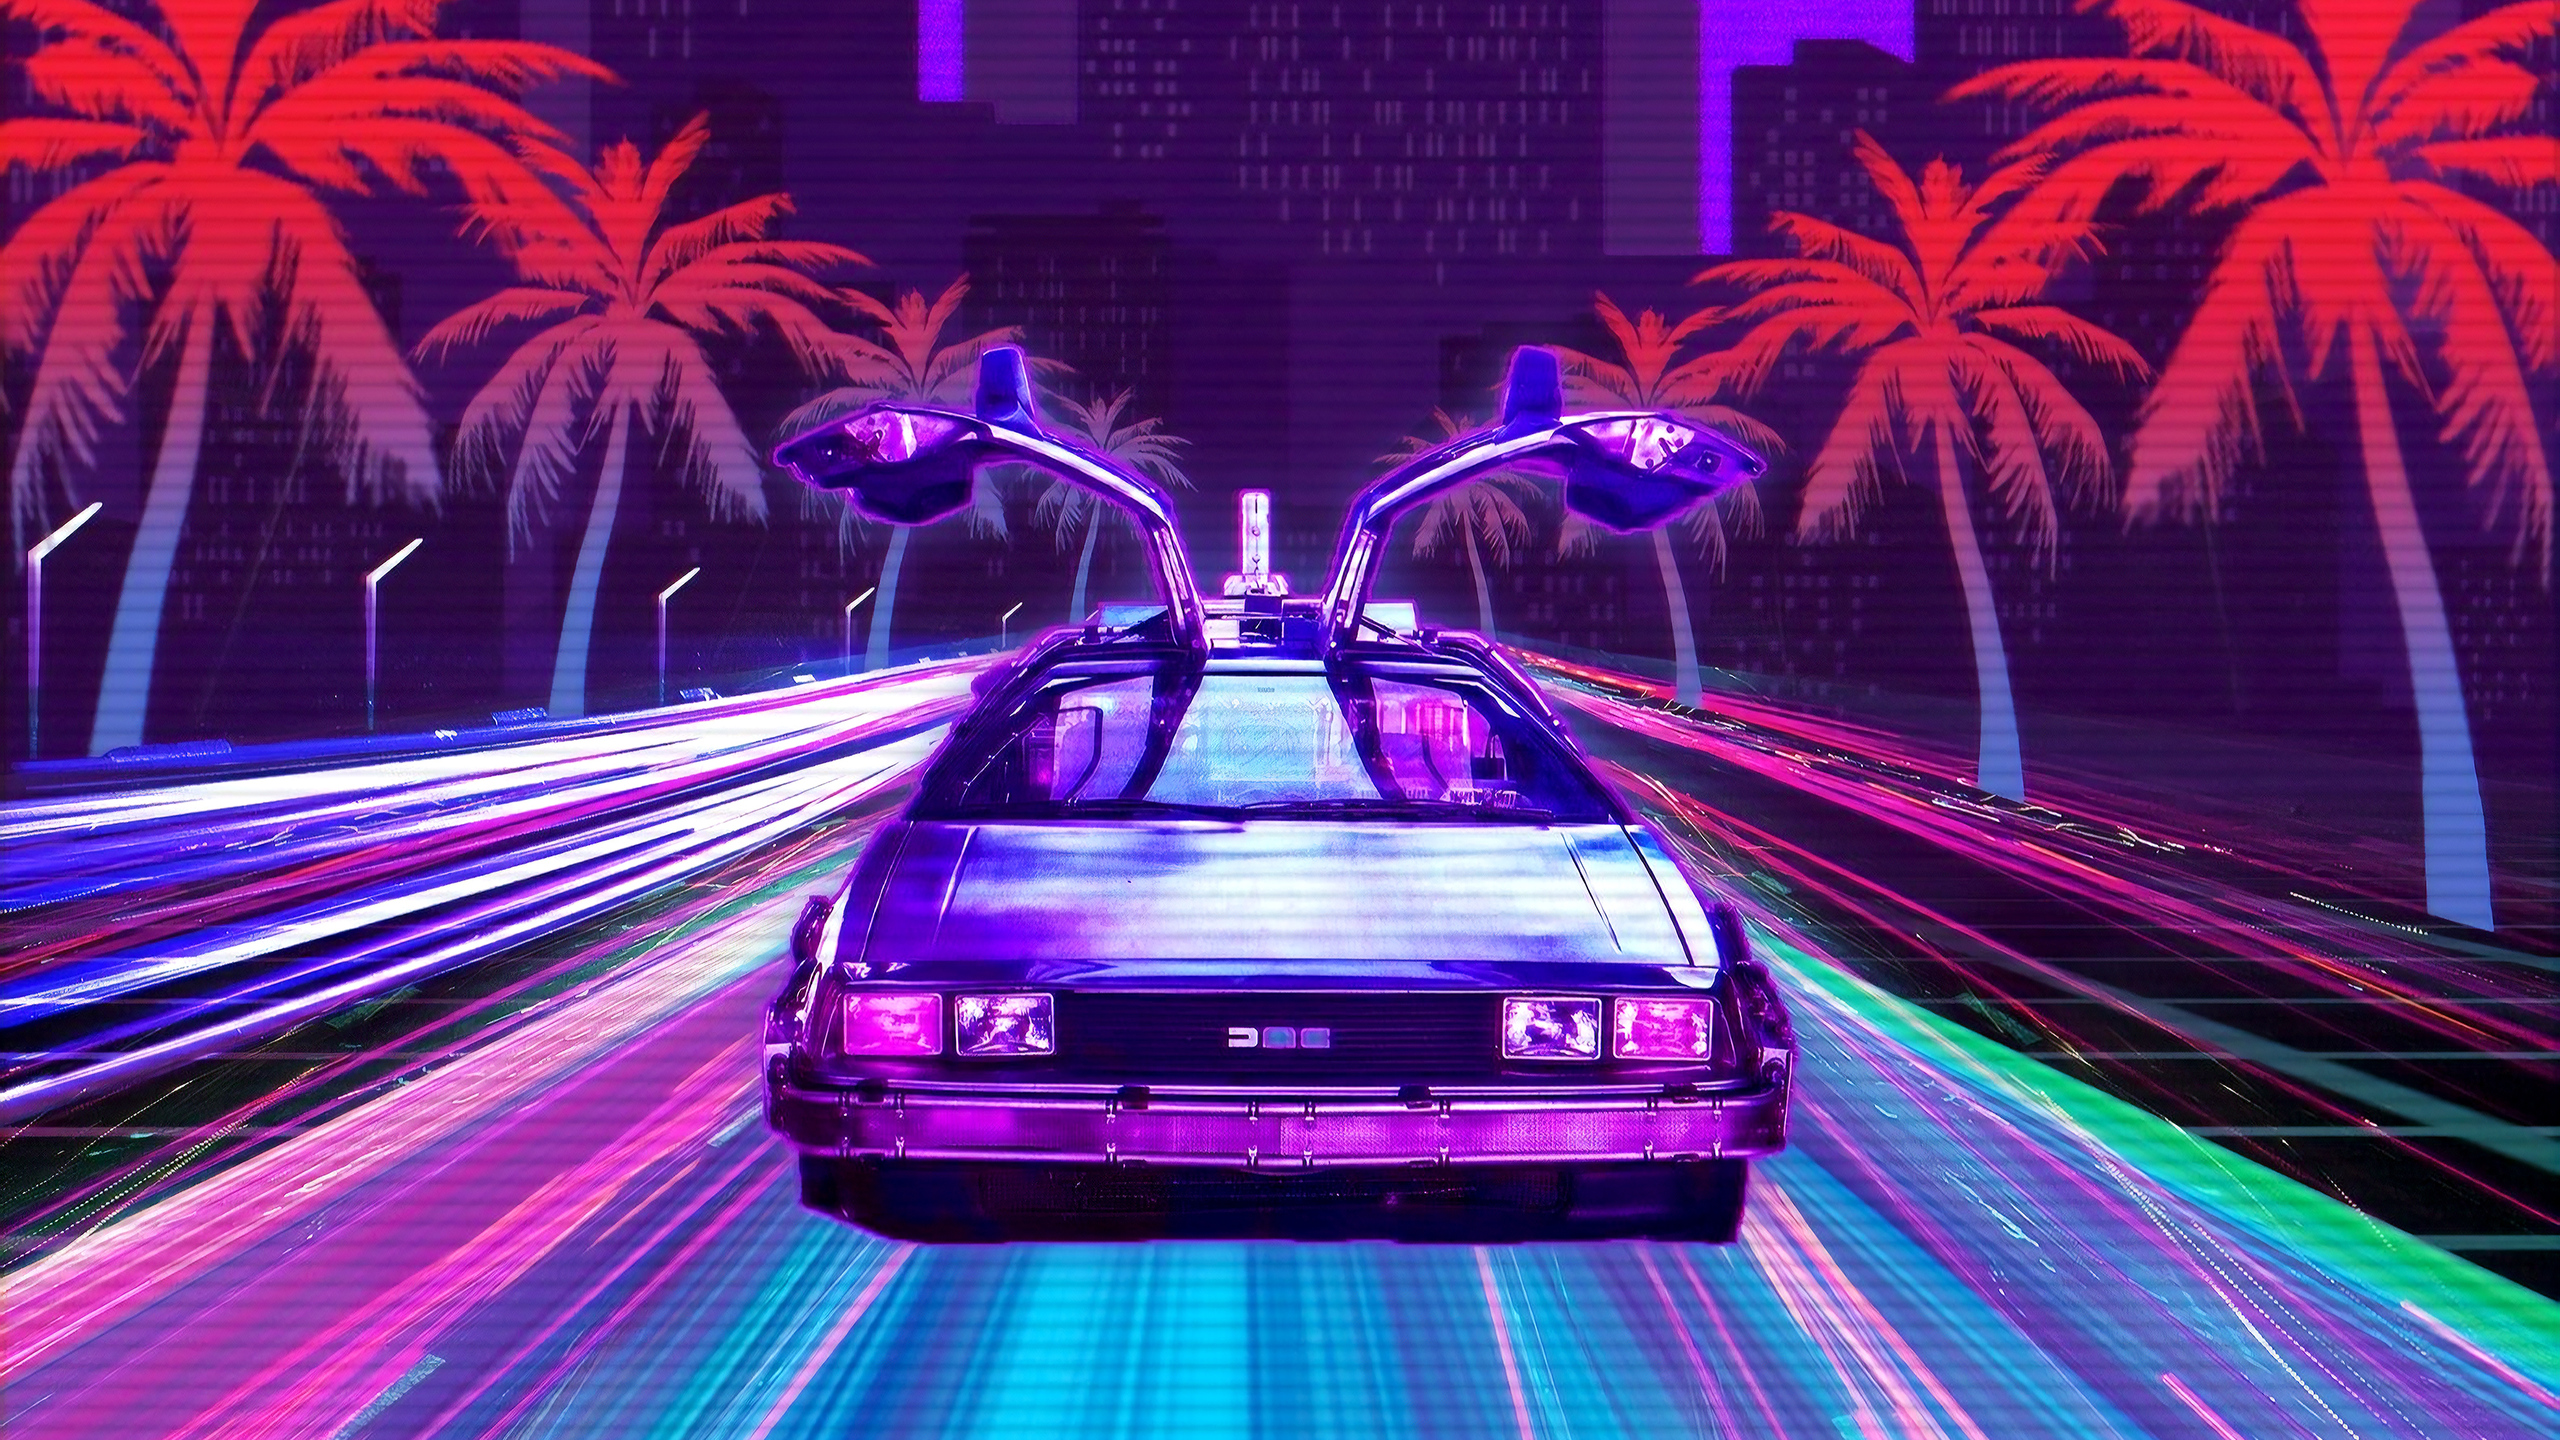 retro-lux-cars-retrowave-4k-gr.jpg